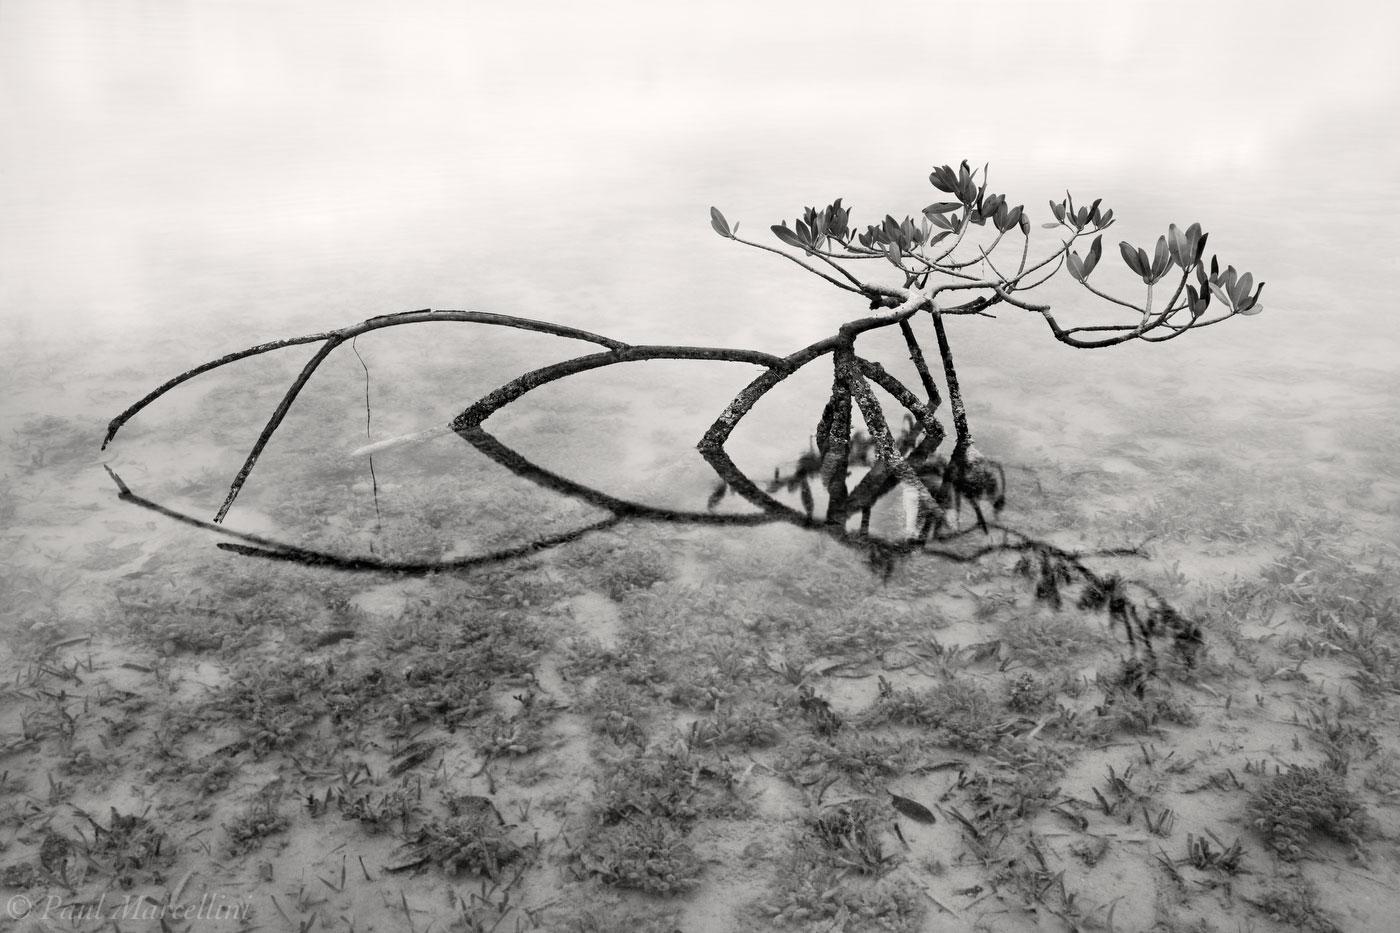 red mangrove, rhizophora mangle, florida, keys, florida keys, south florida, nature, photography, photo